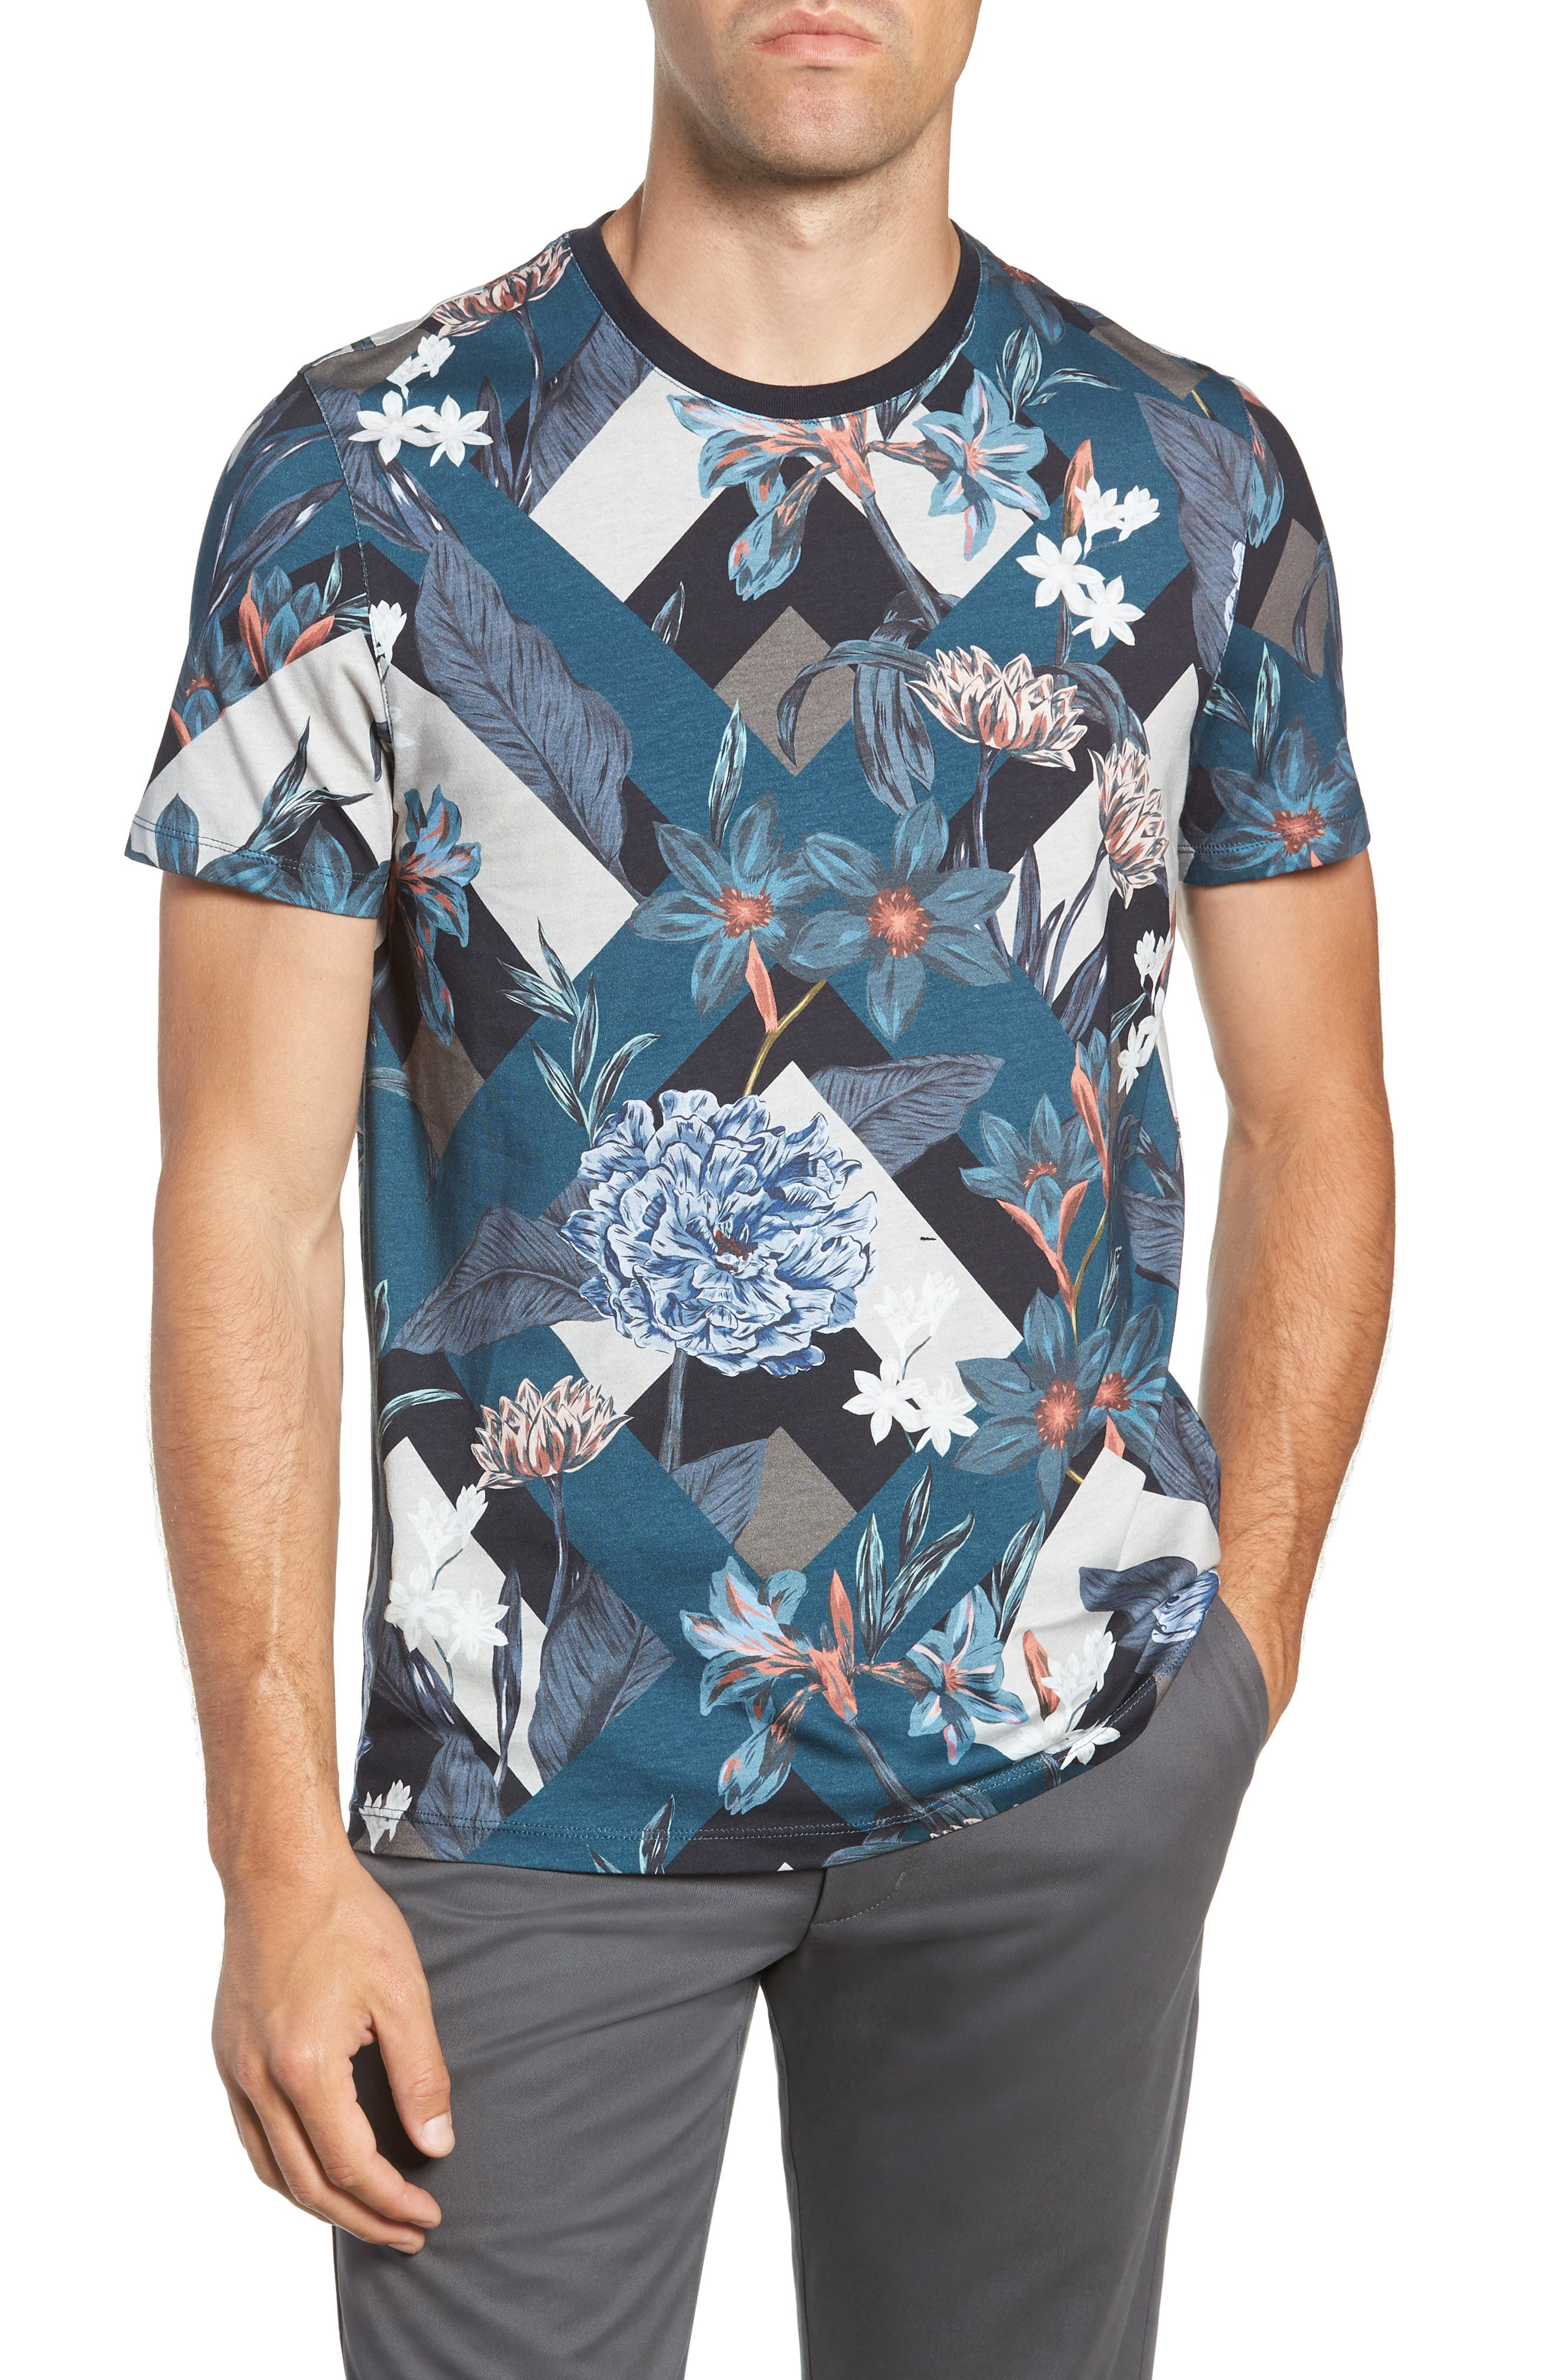 Jolly Slim Fit T-Shirt,                         Main,                         color, NAVY